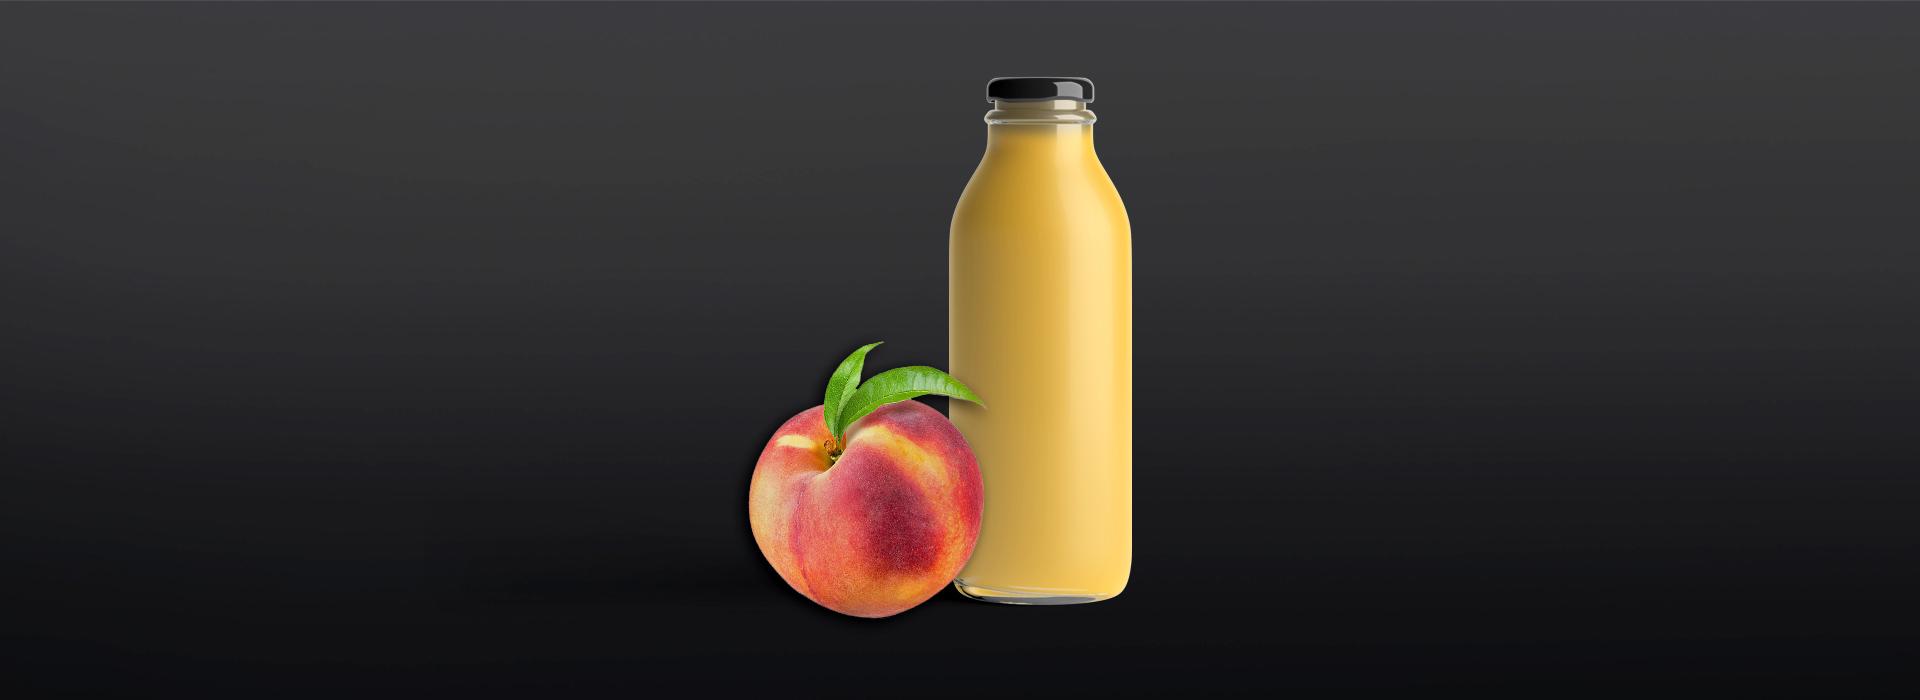 Sraml-Peach-puree